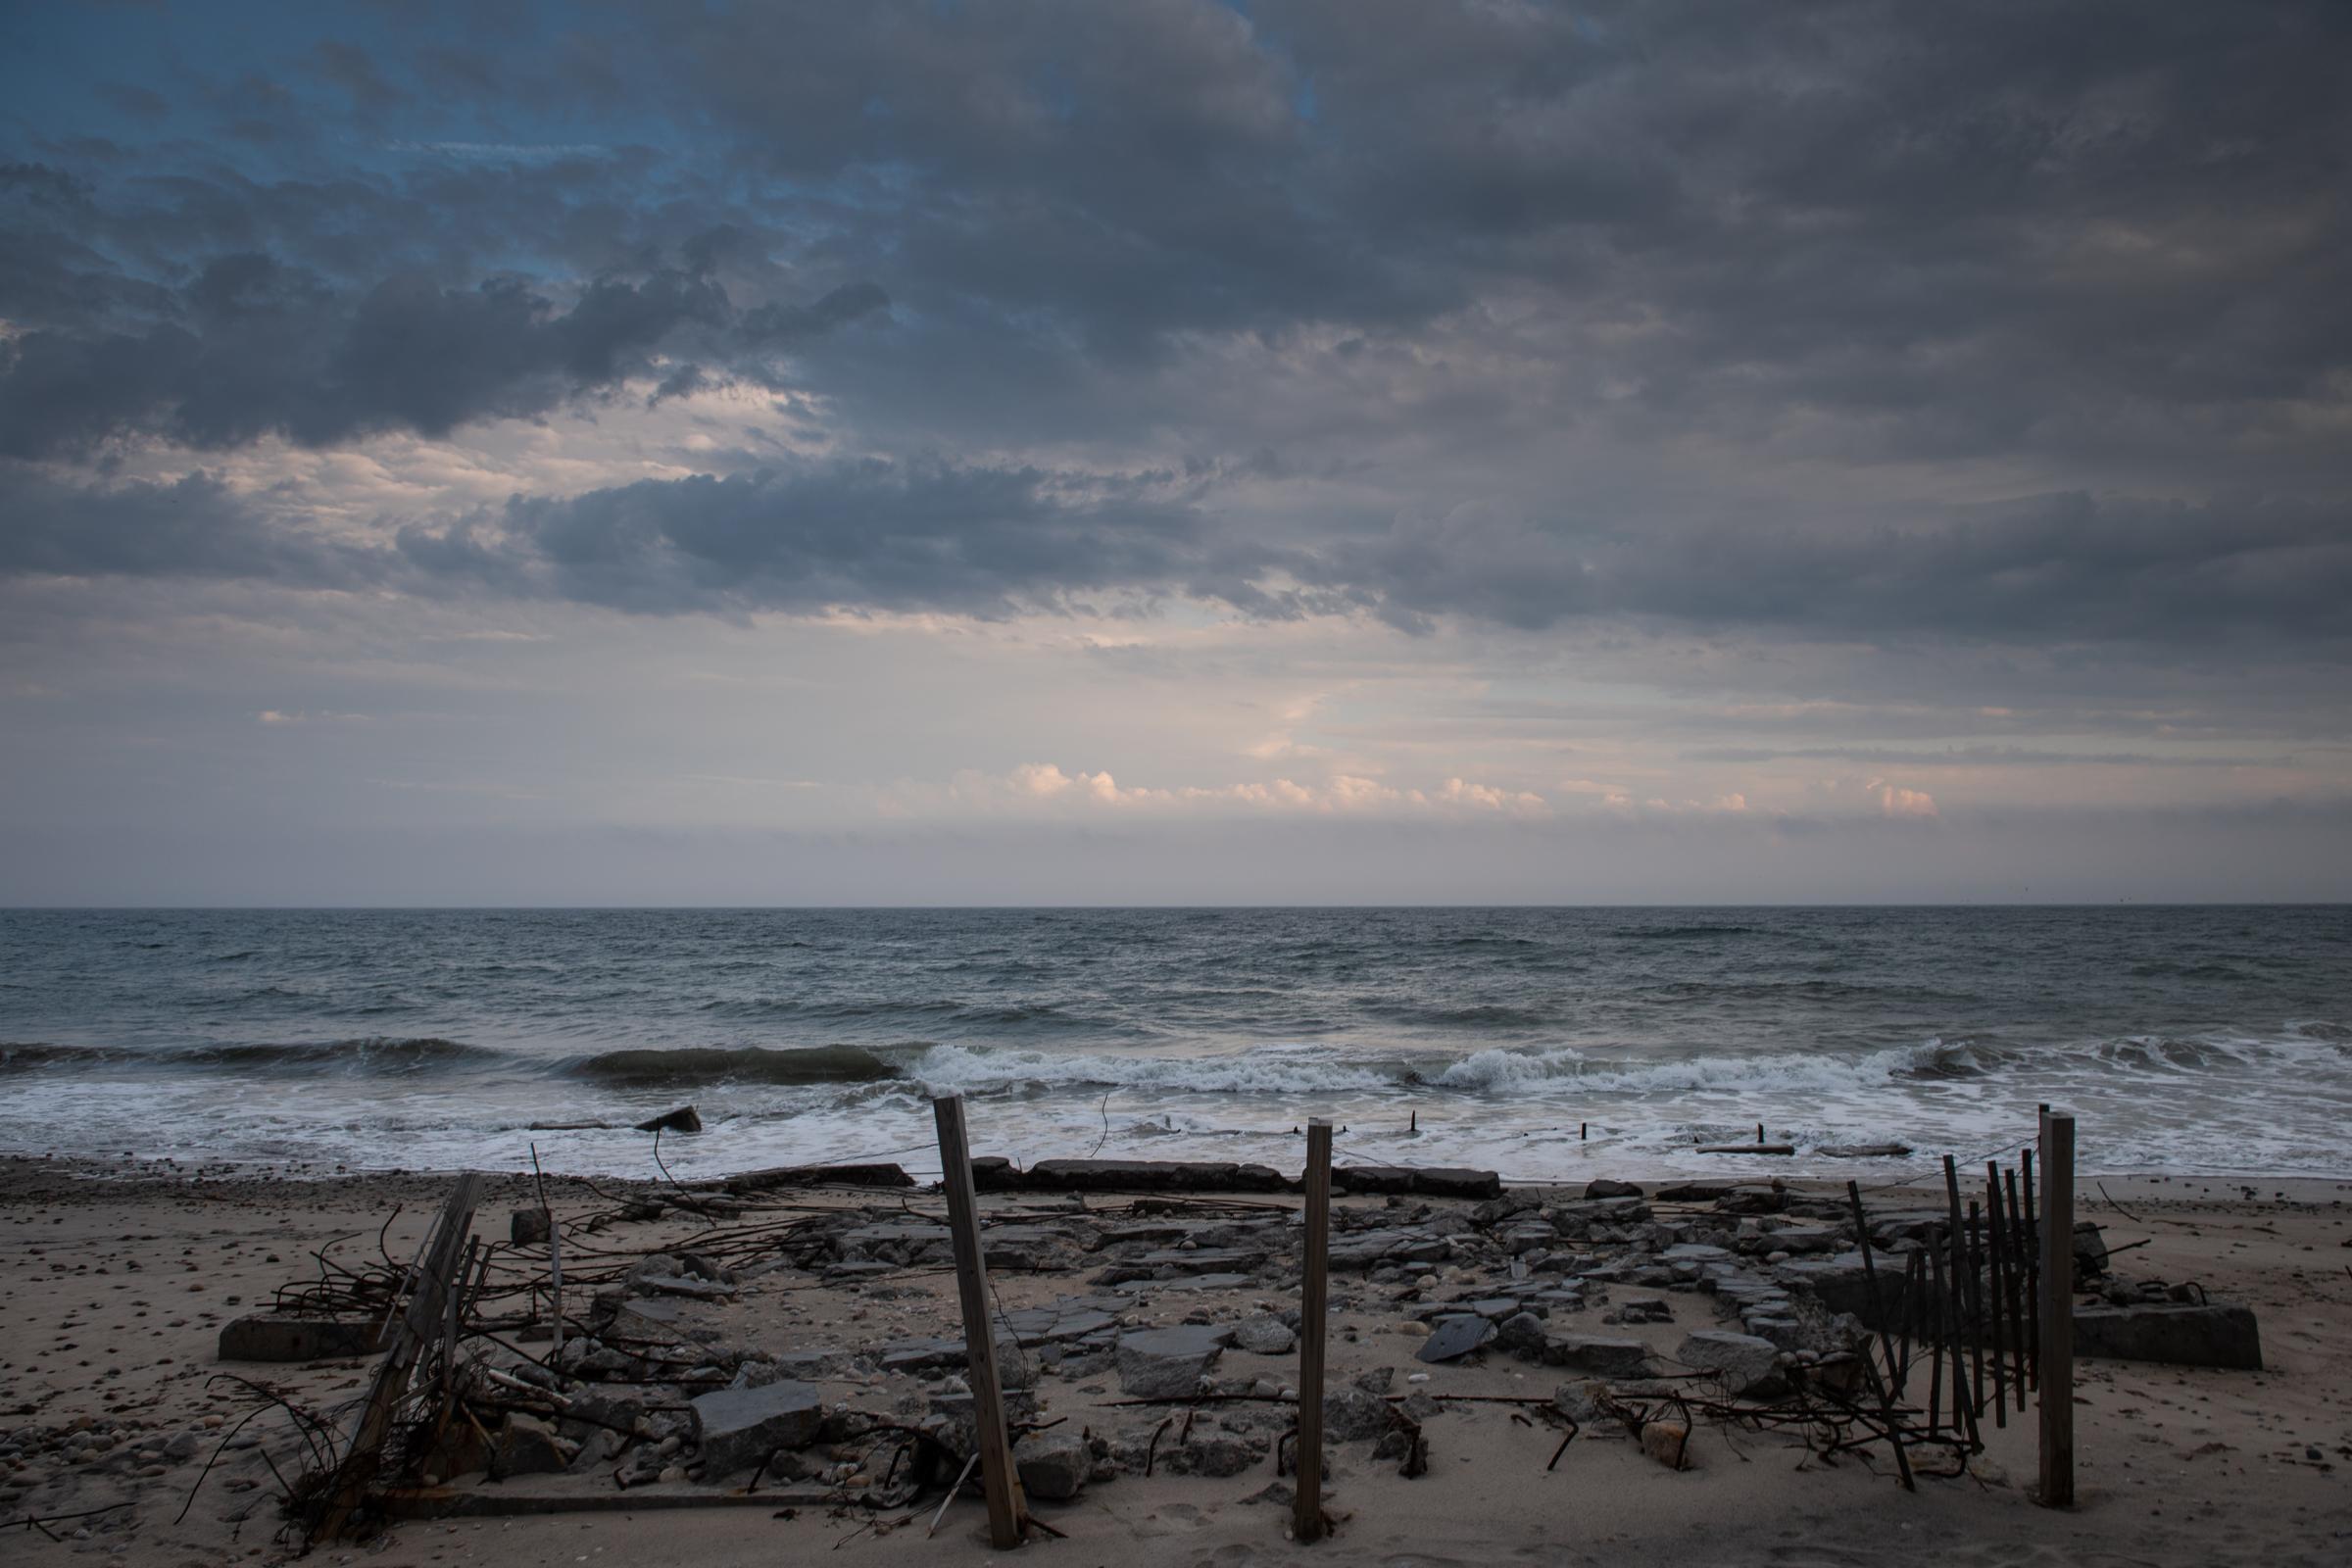 beach covered in wood debris